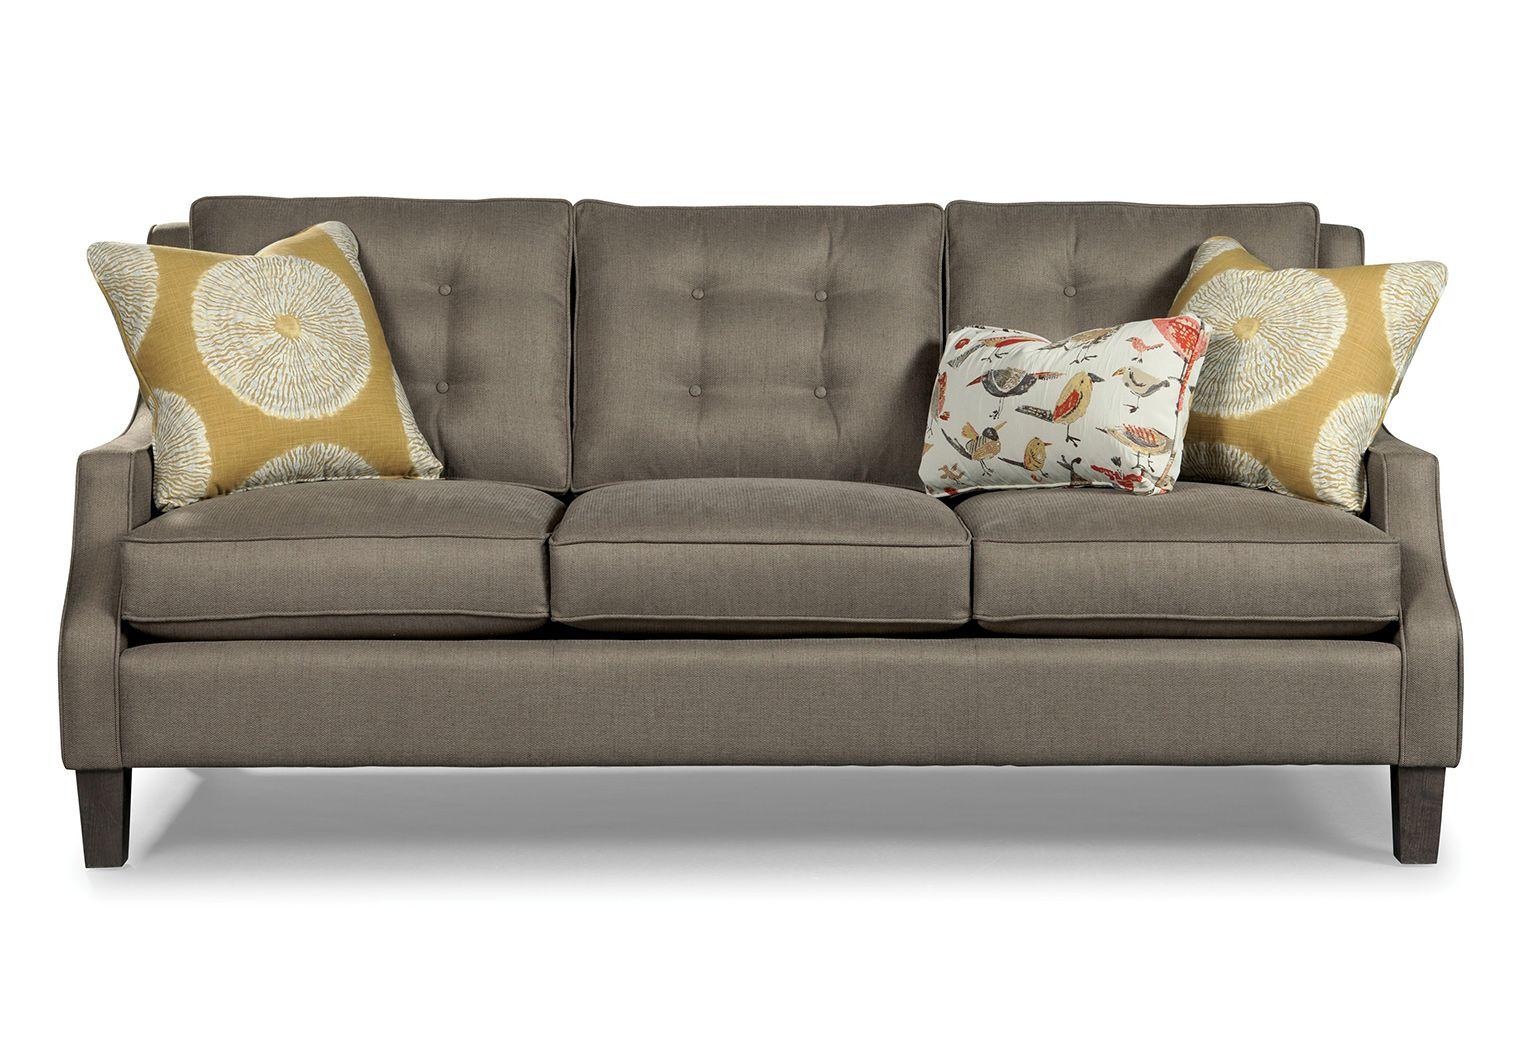 Rachael Ray Sofa Sleeper Baci Living Room